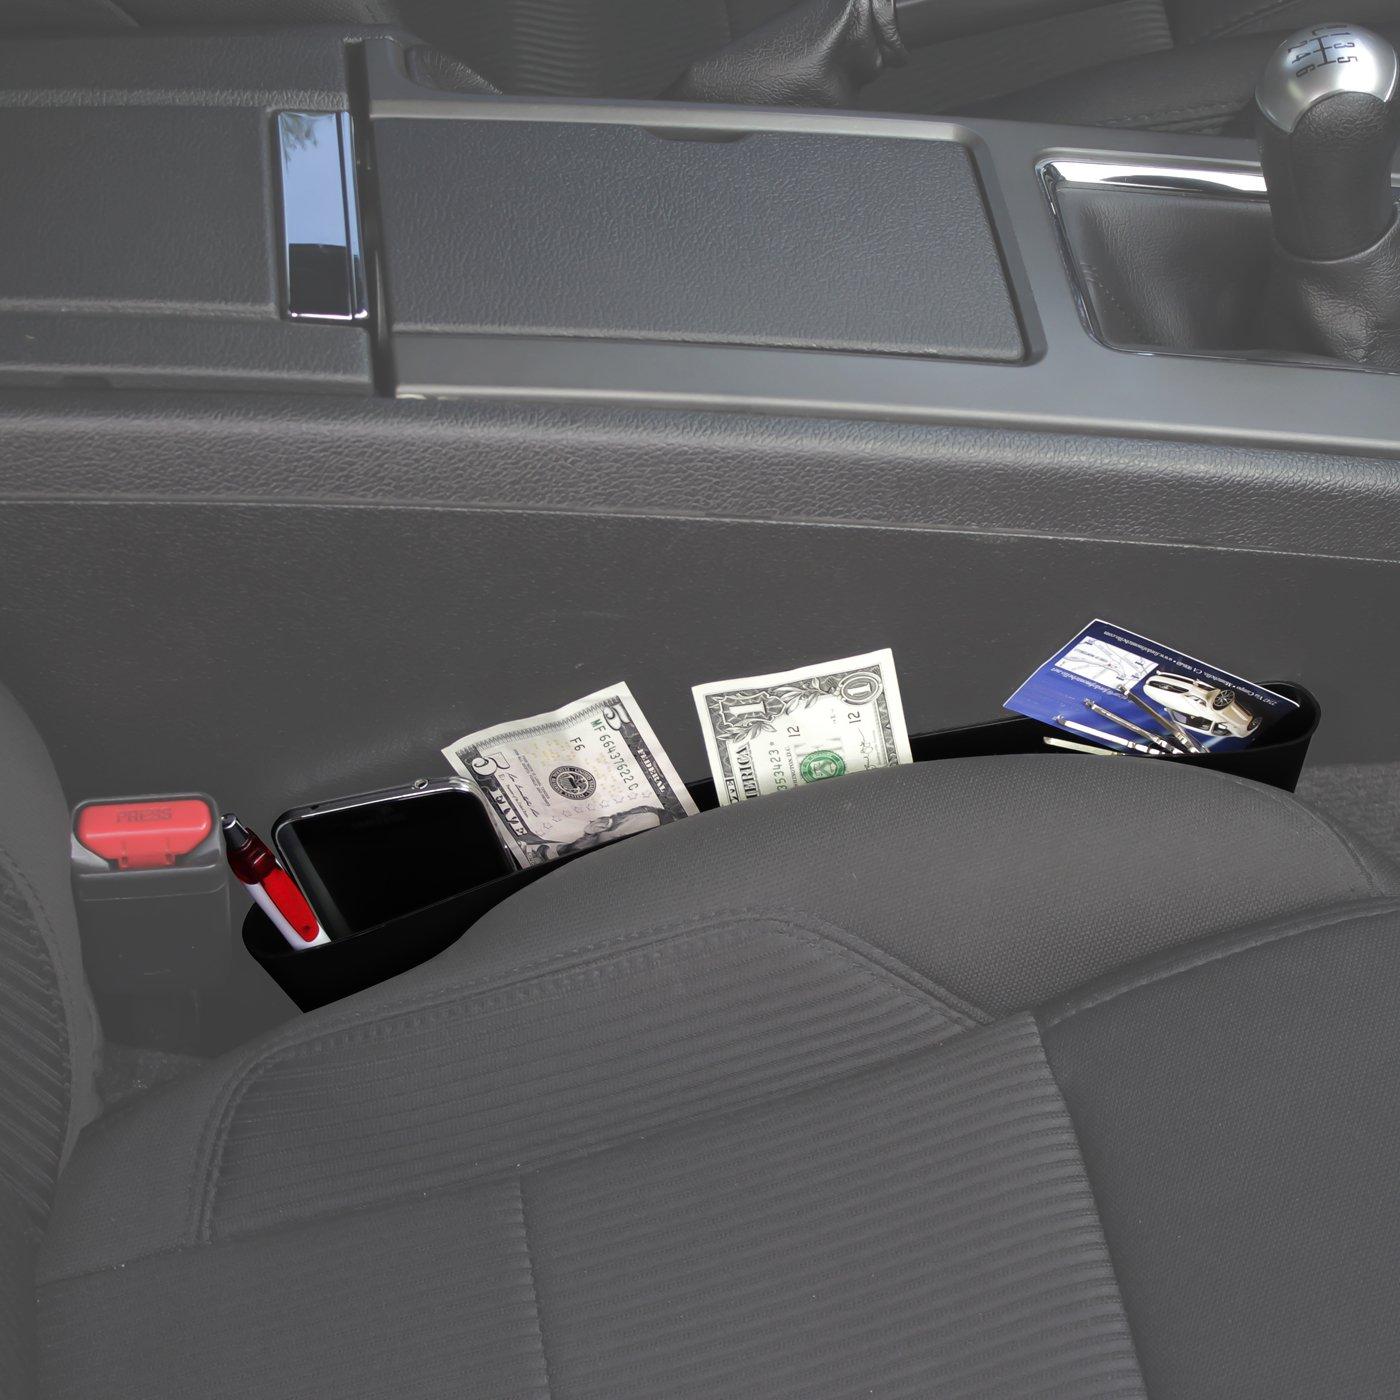 OxGord Auto Caddy Slit Pocket Gap Organizer Side Car Seat Tray Box Space Console for Van Truck SUV